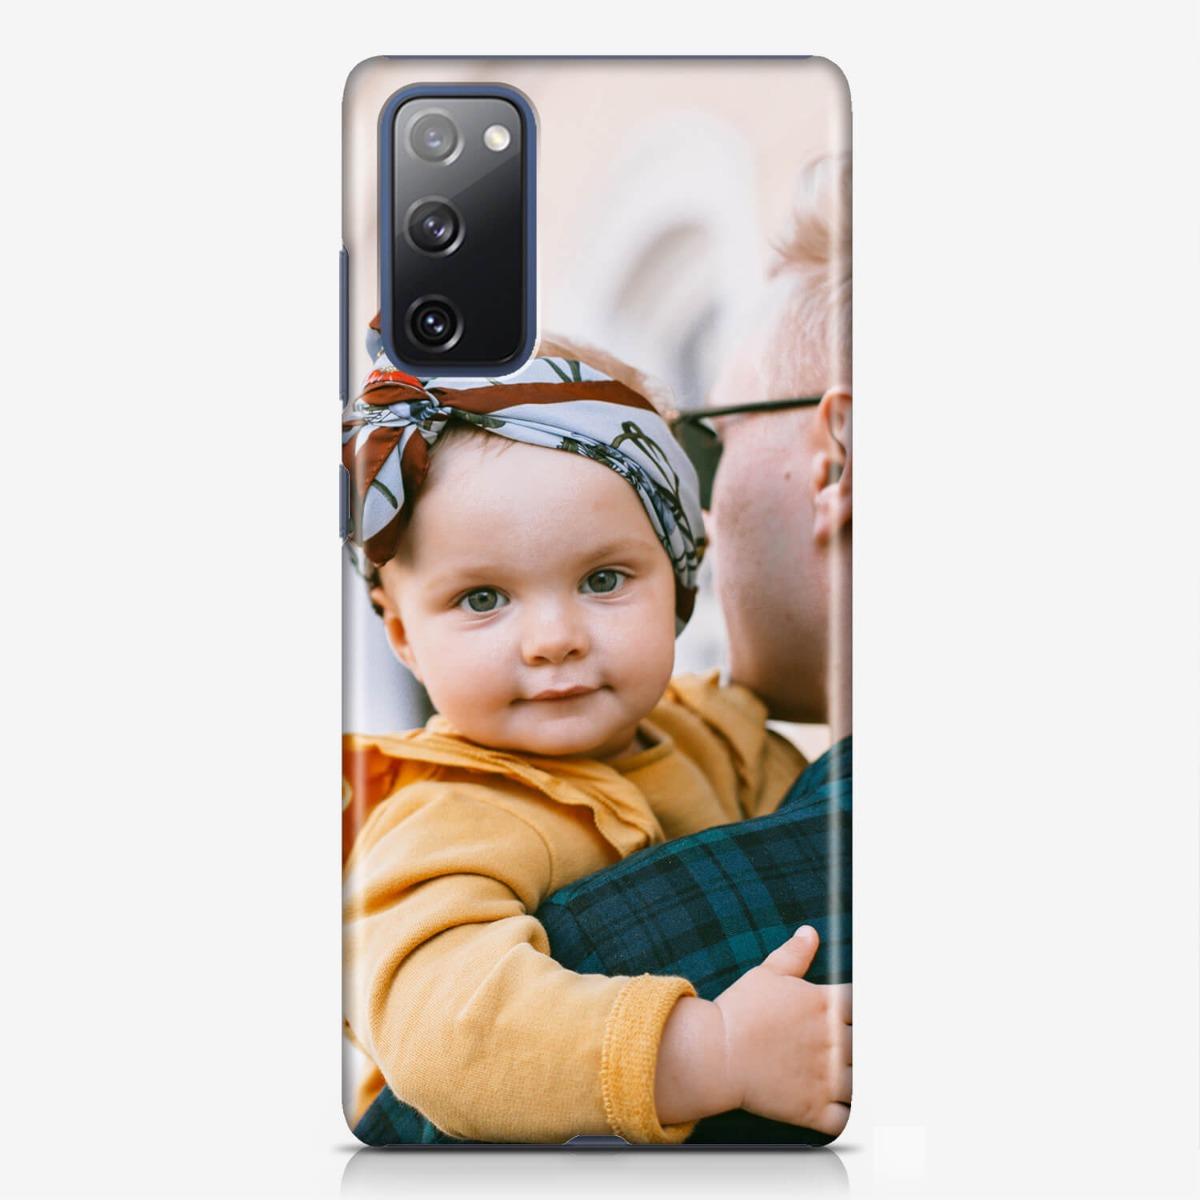 Galaxy S20 FE Hard Case 16364